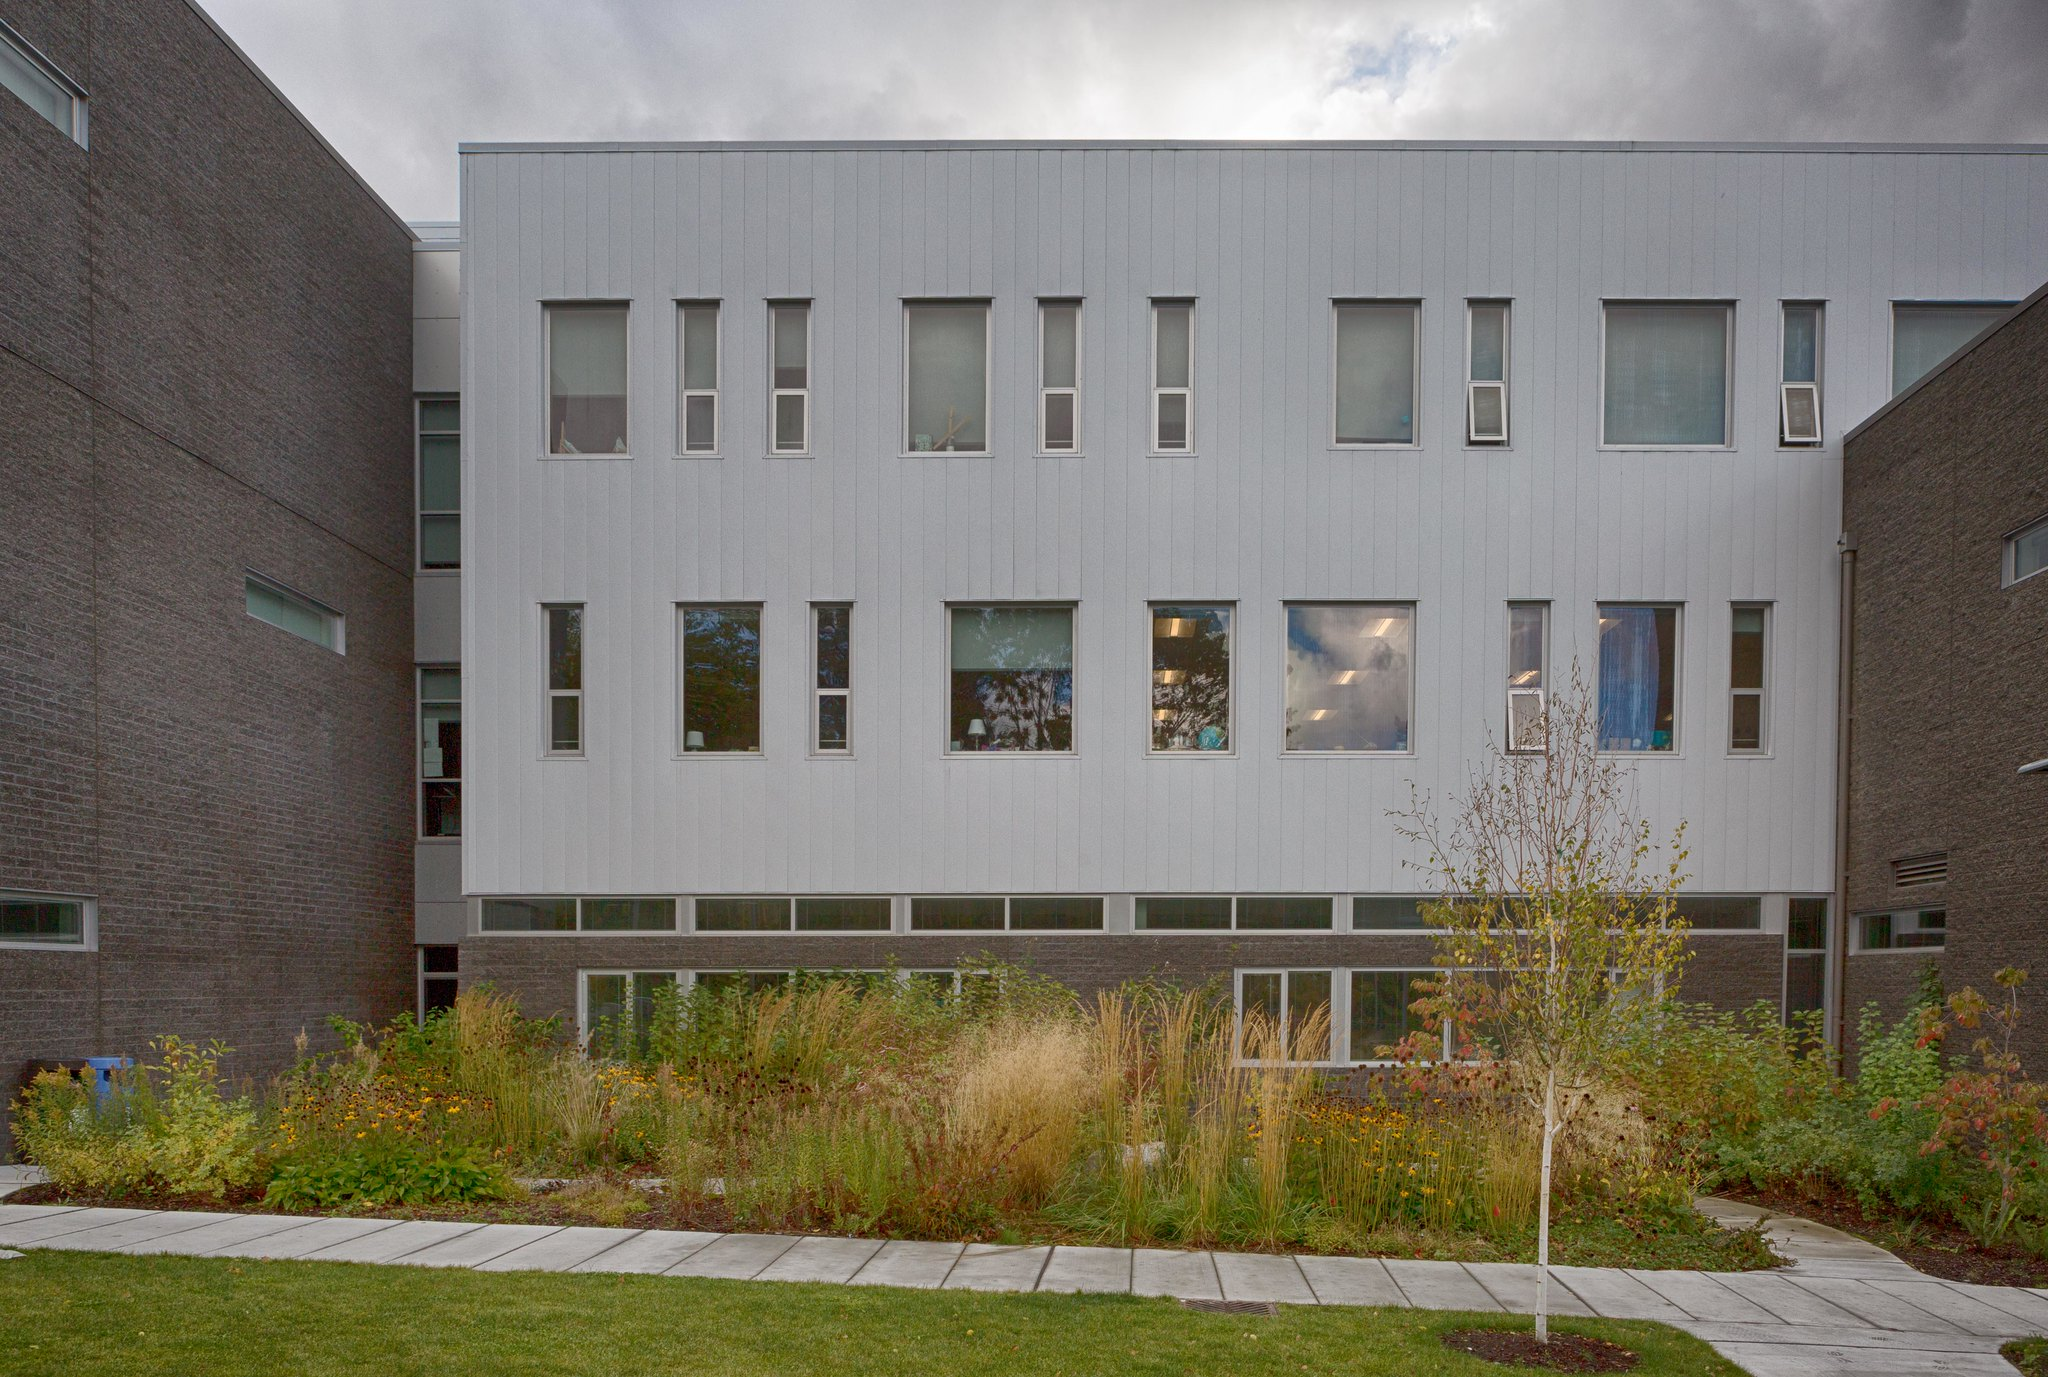 Hazel Wolf K-8 ESTEM School